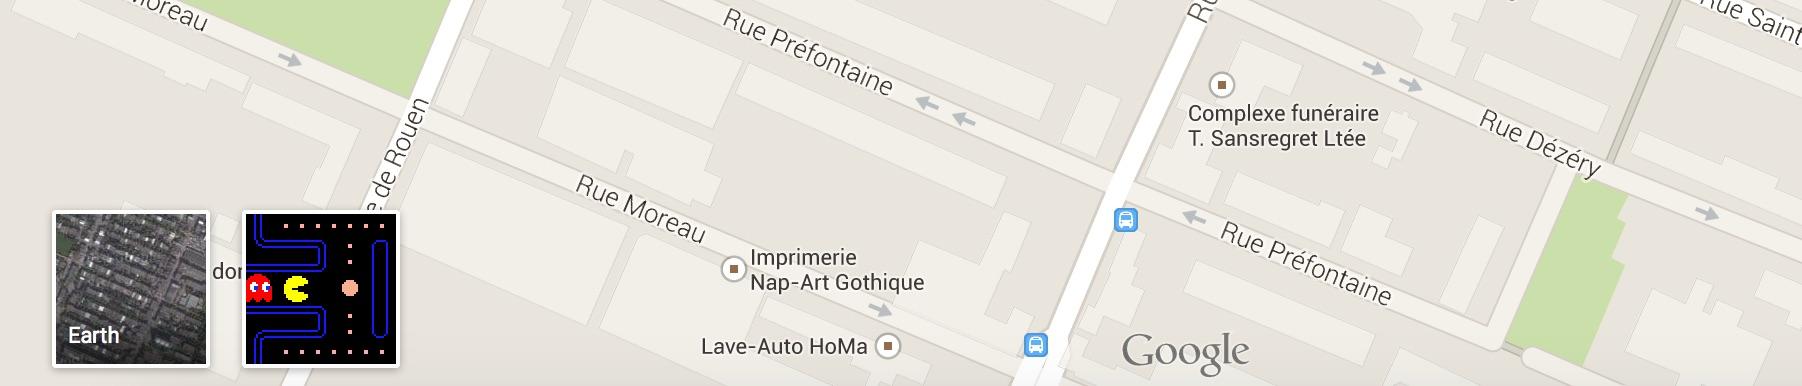 Pacman - Google Maps 1